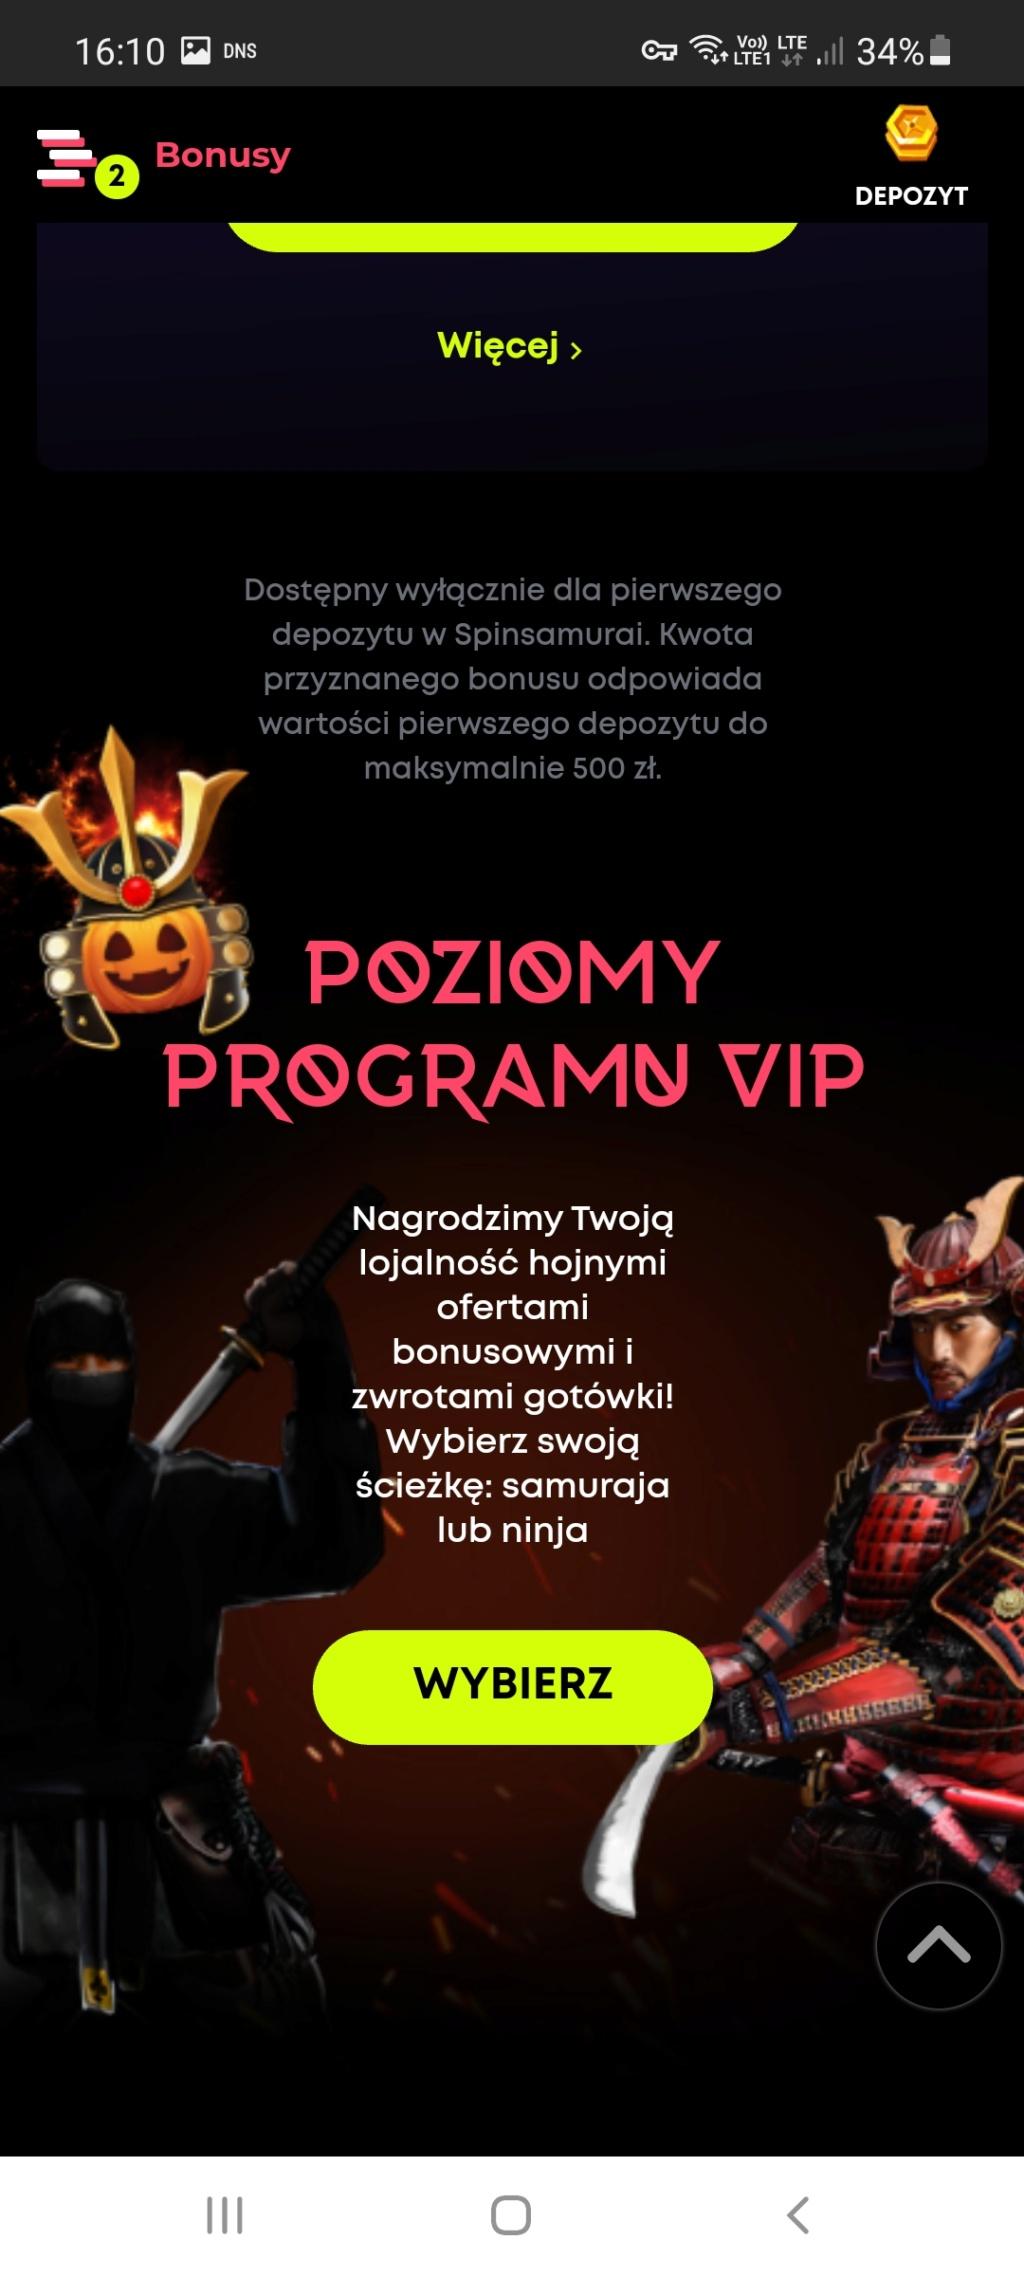 Spin Samurai kasyno online 20 darmowych spinów bez depozytu (exclusive) - Page 2 Screen26